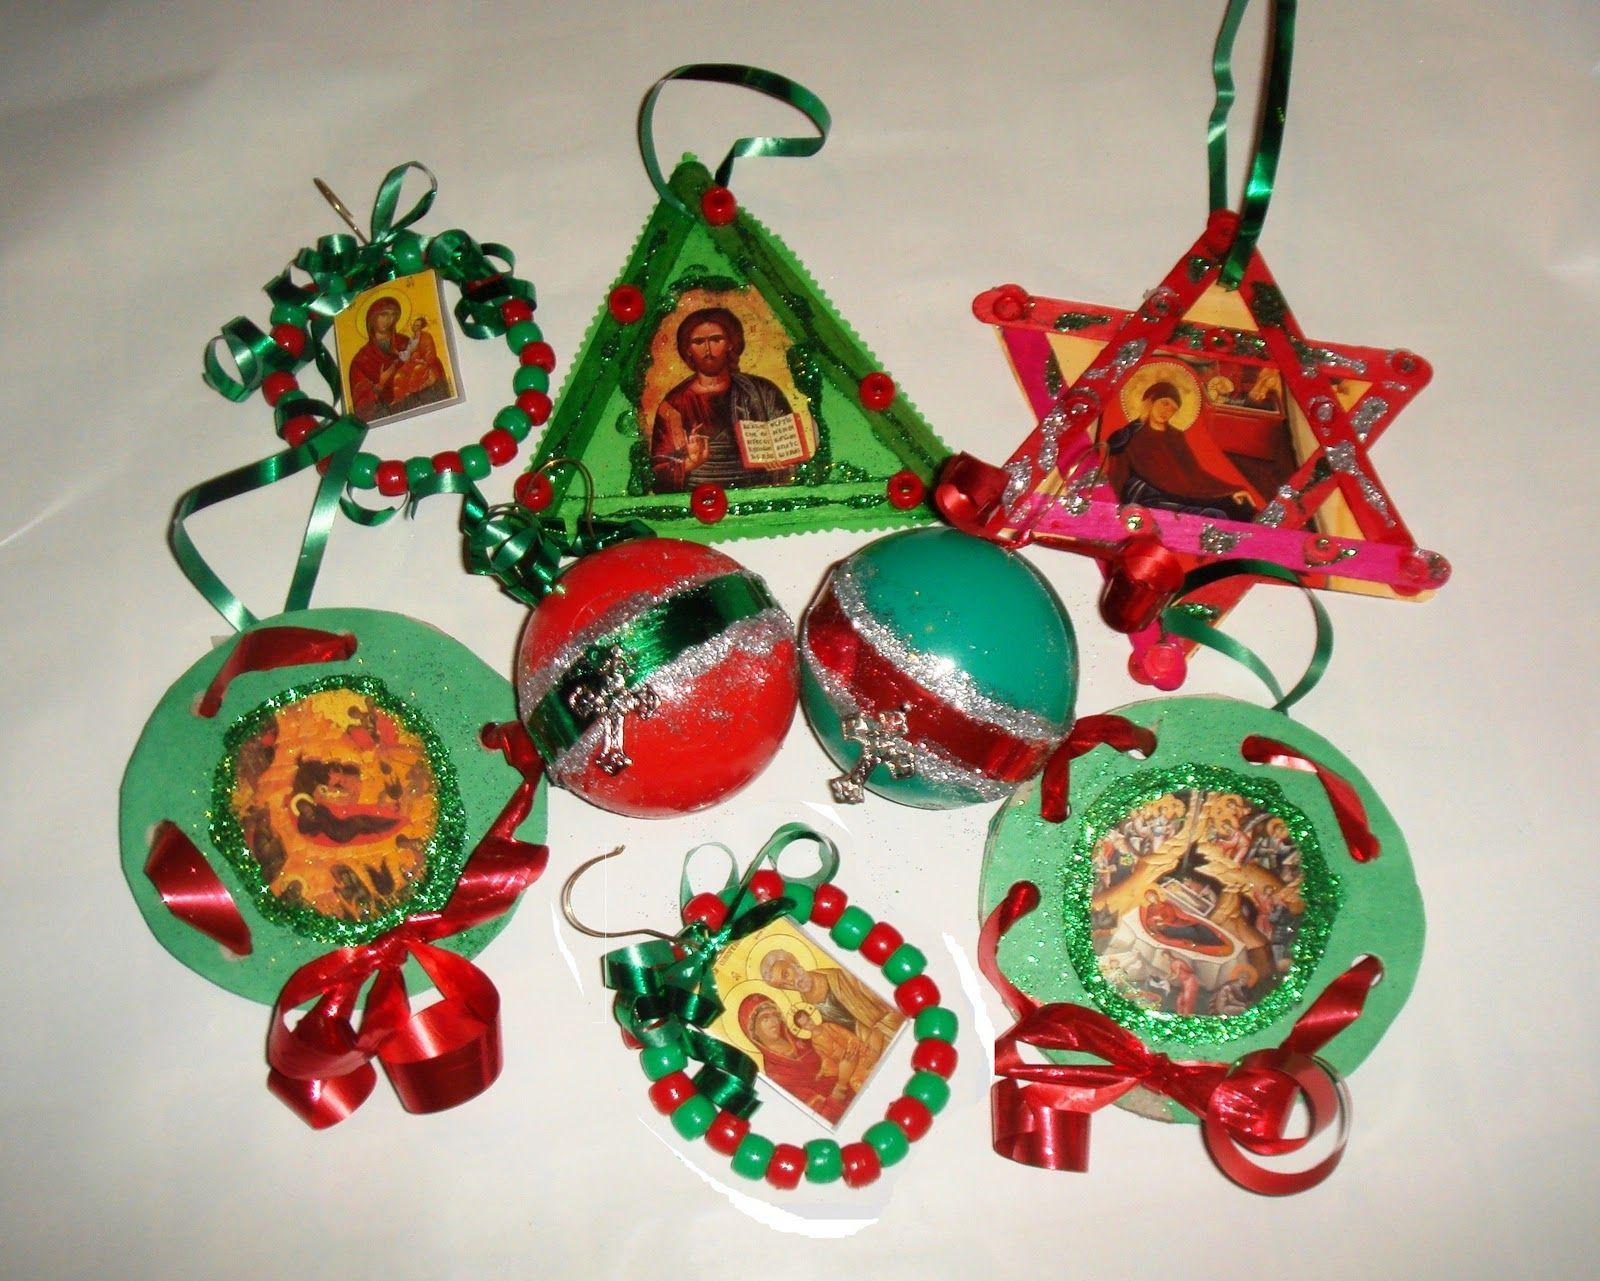 1 7 Orthodox Christian Christmas children